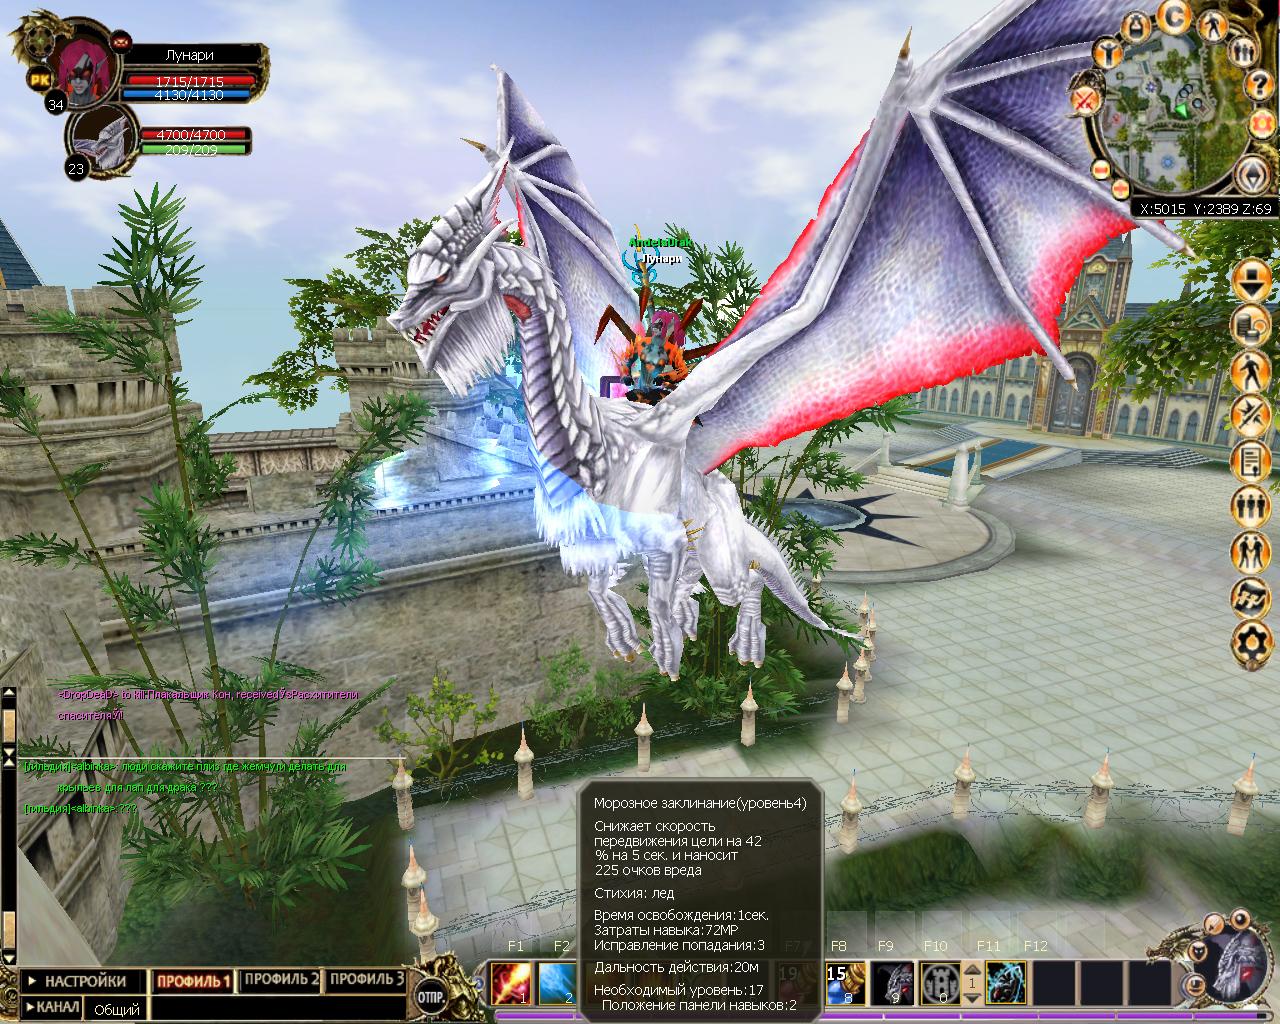 Игра про дракончиков